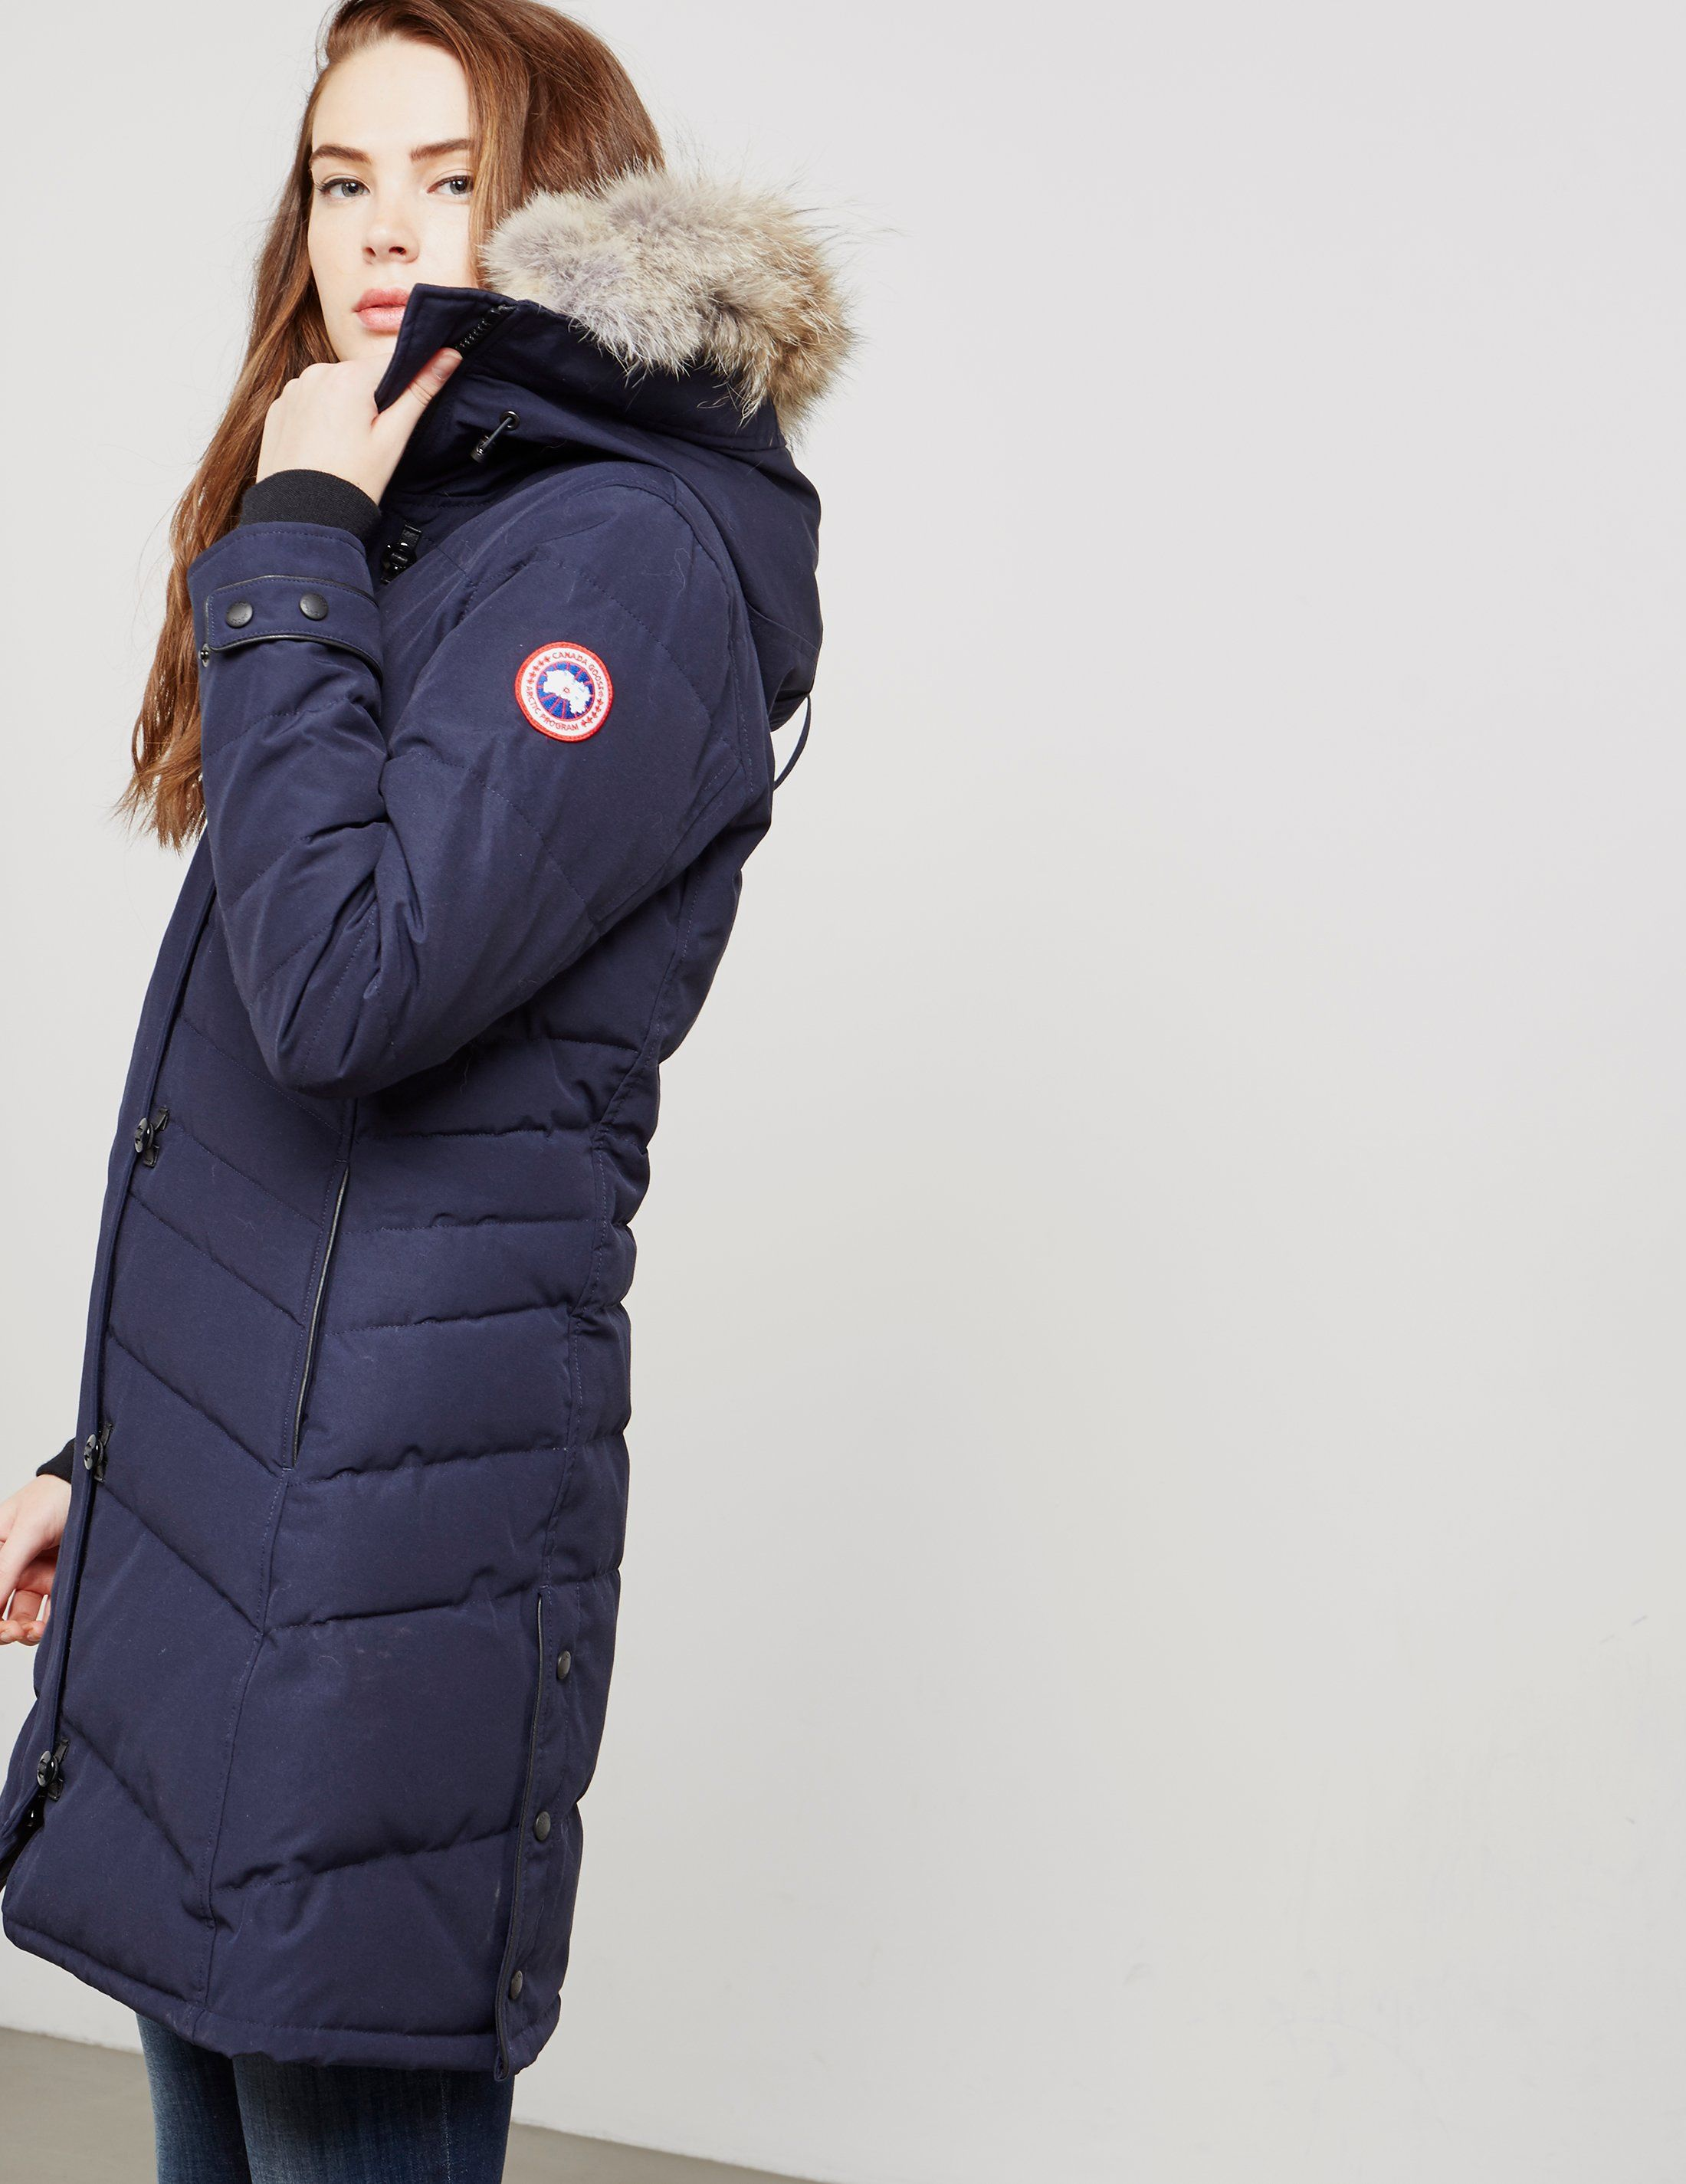 Canada Goose Lorette Padded Parka Jacket